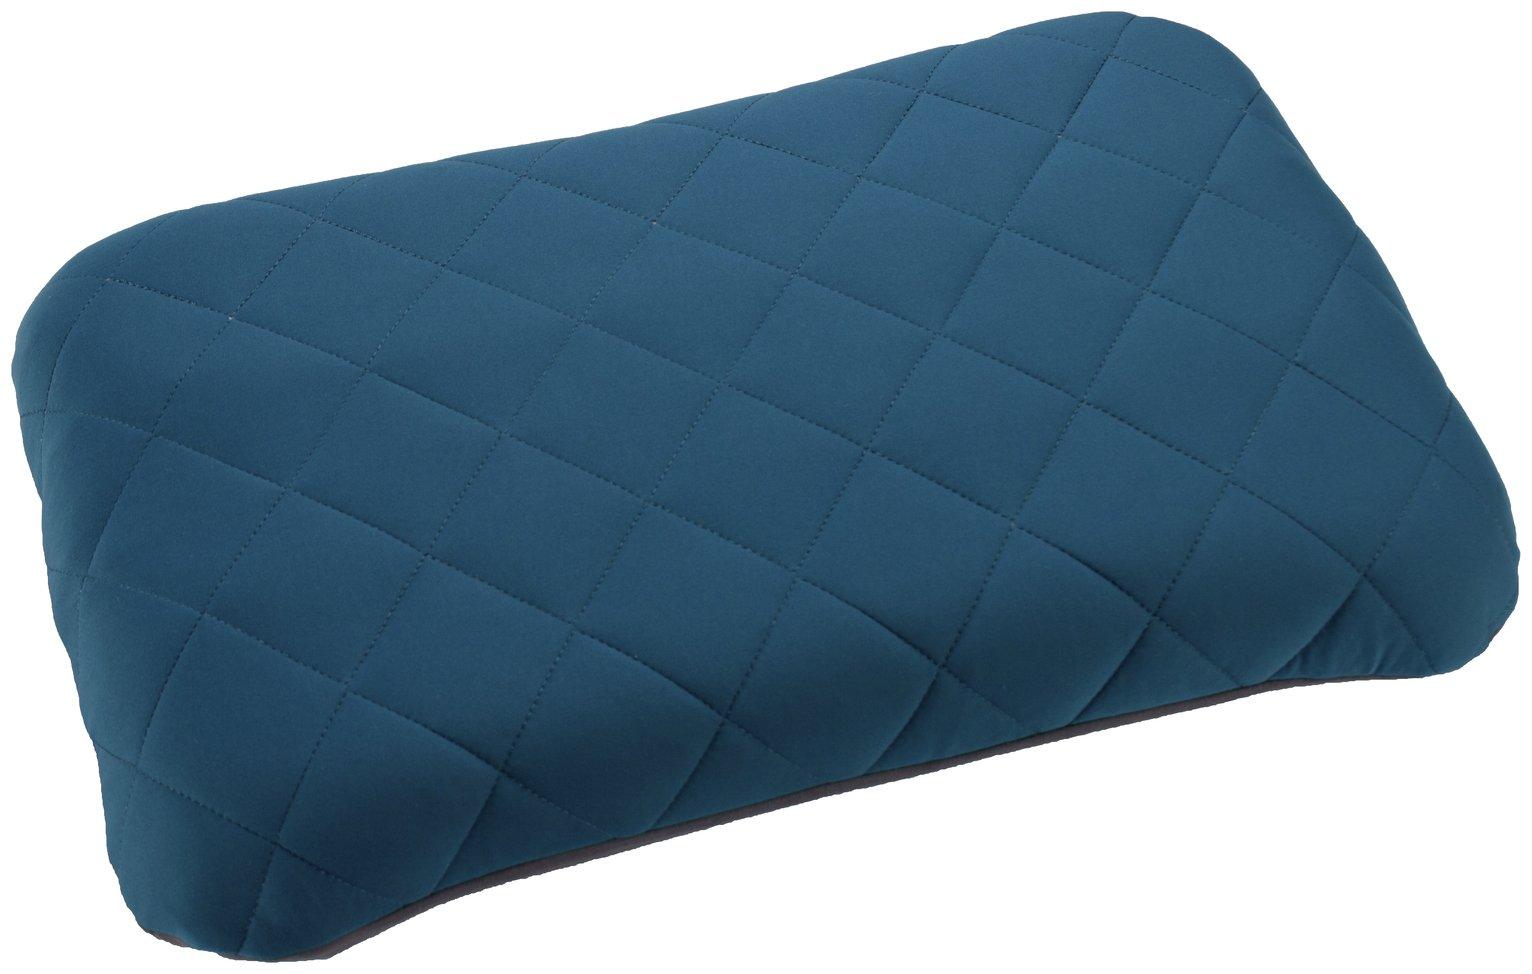 Vango Deep Sleep Thermo Camping Pillow